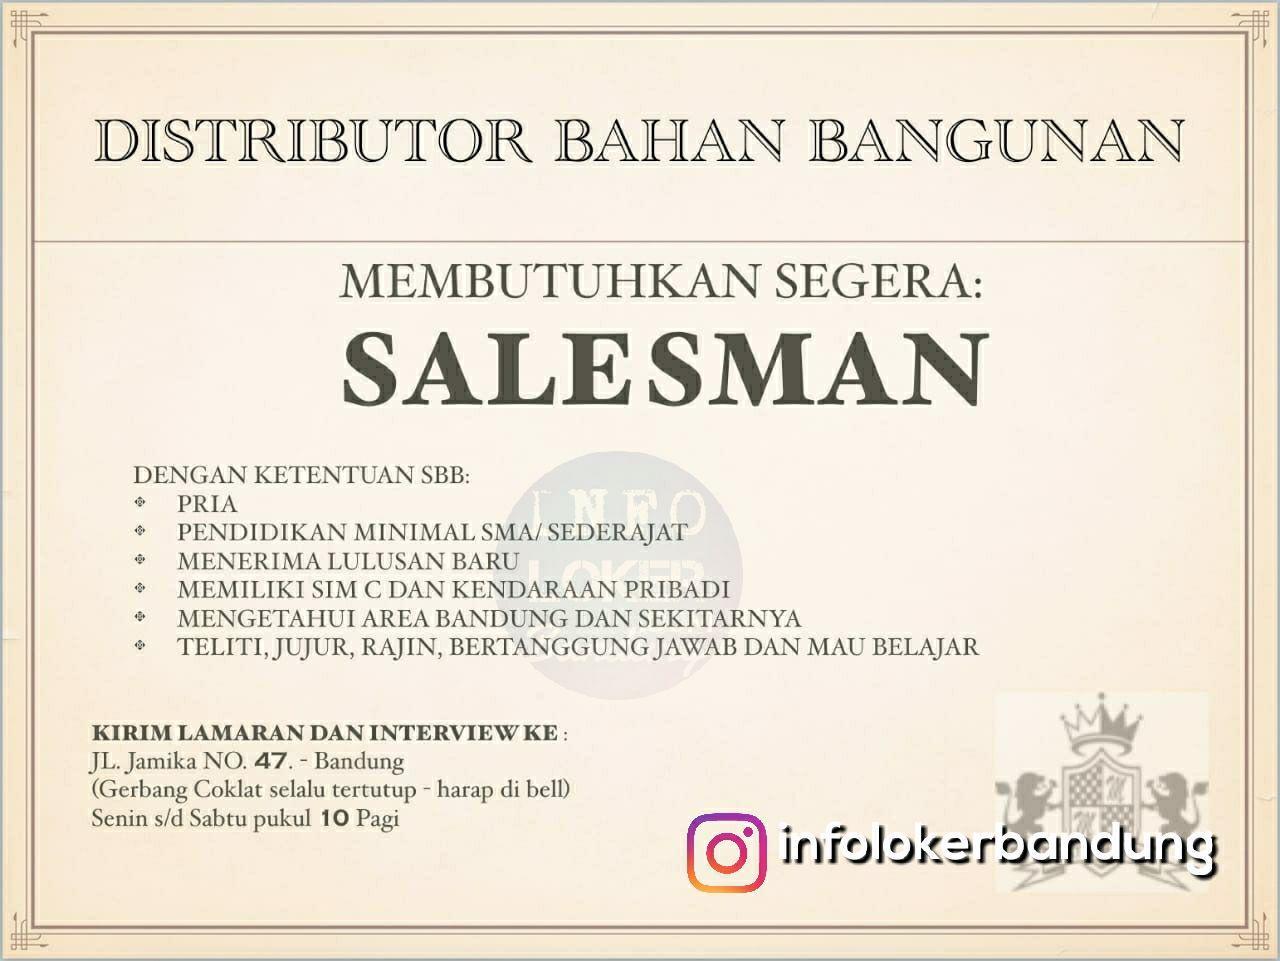 Lowongan Kerja Salesman Distributor Bahan Bangunan Bandung November 2018